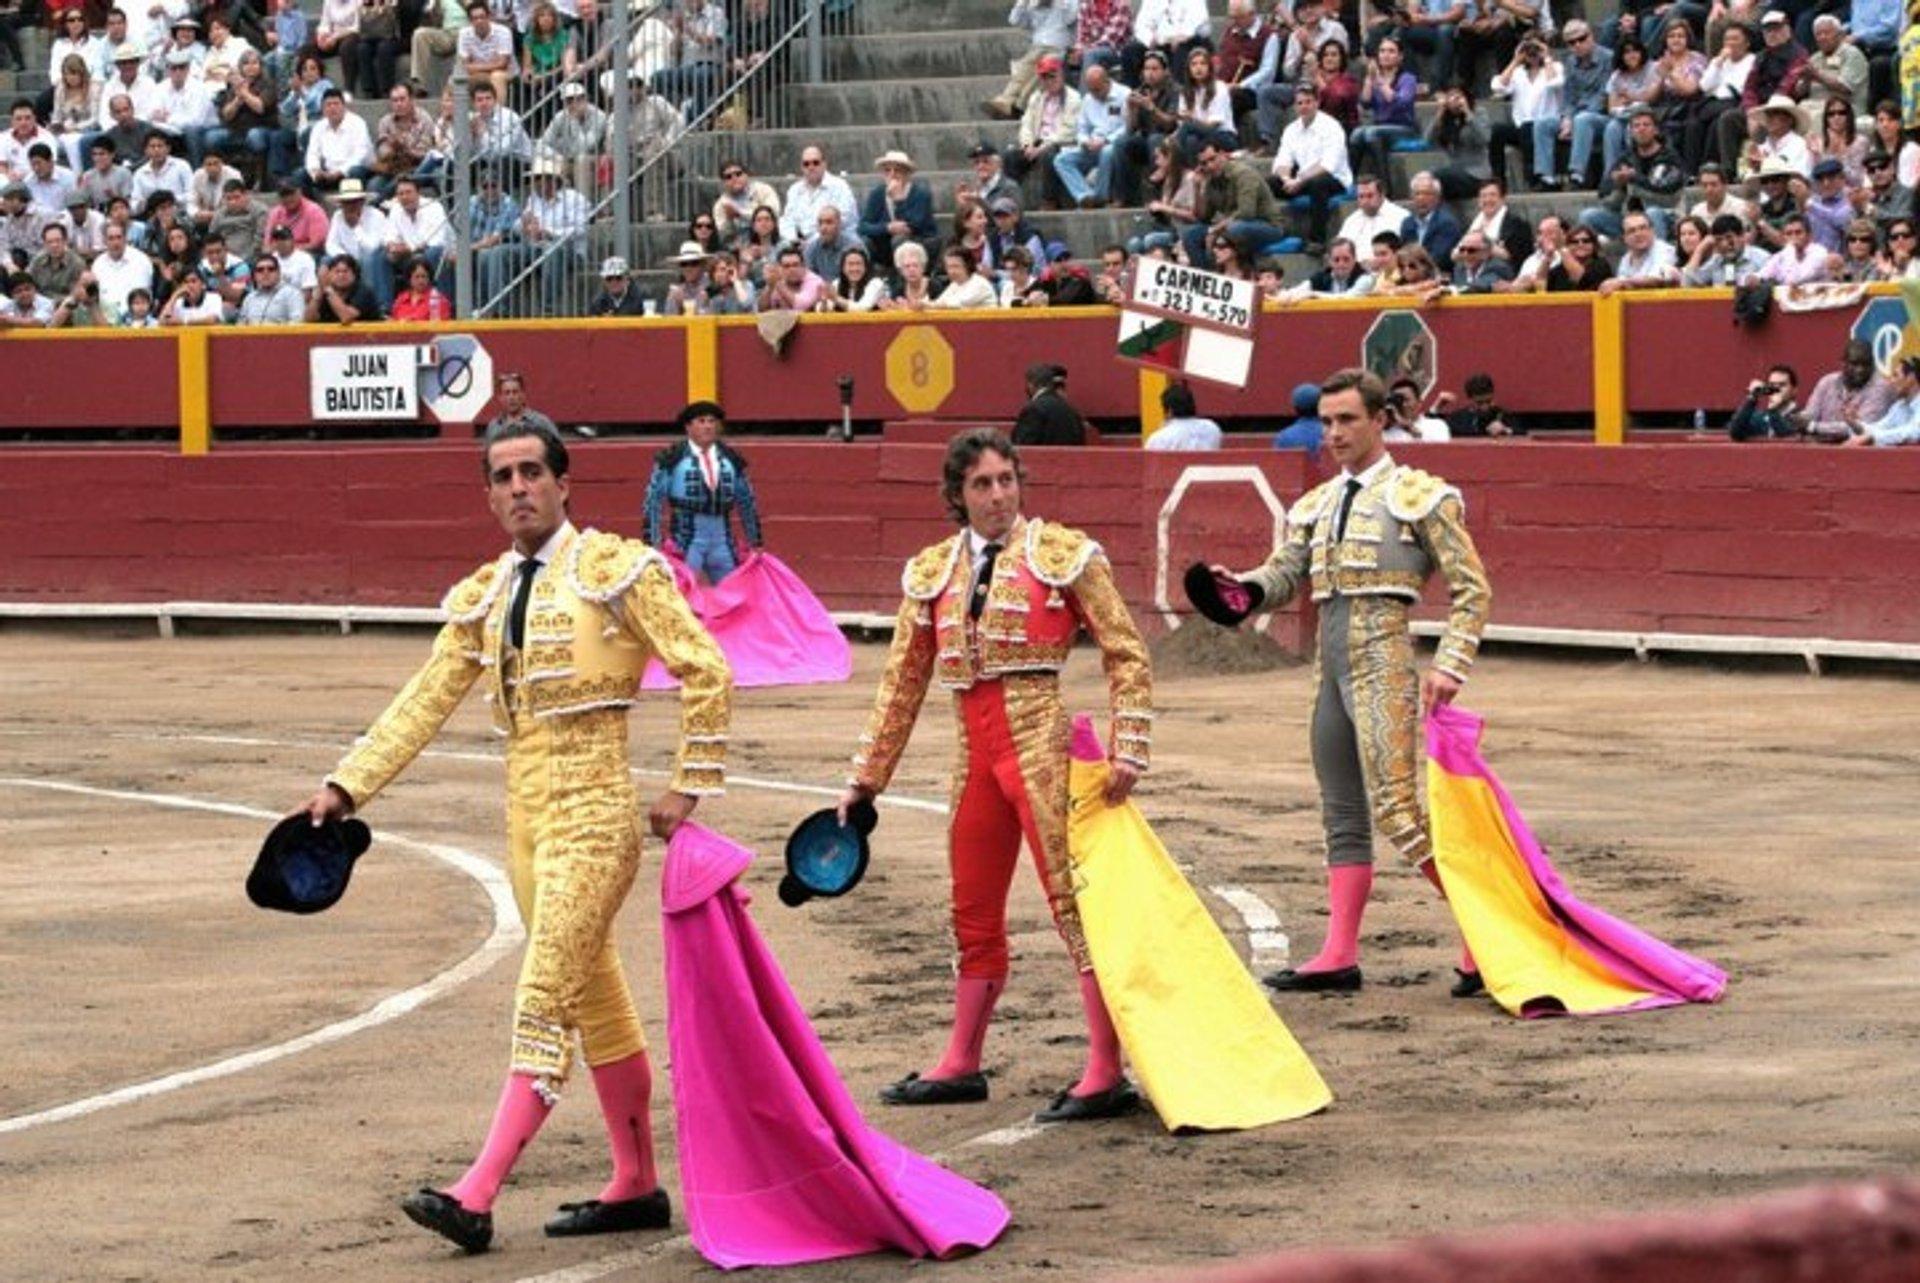 Bullfighting Season in Lima in Peru 2019 - Best Time